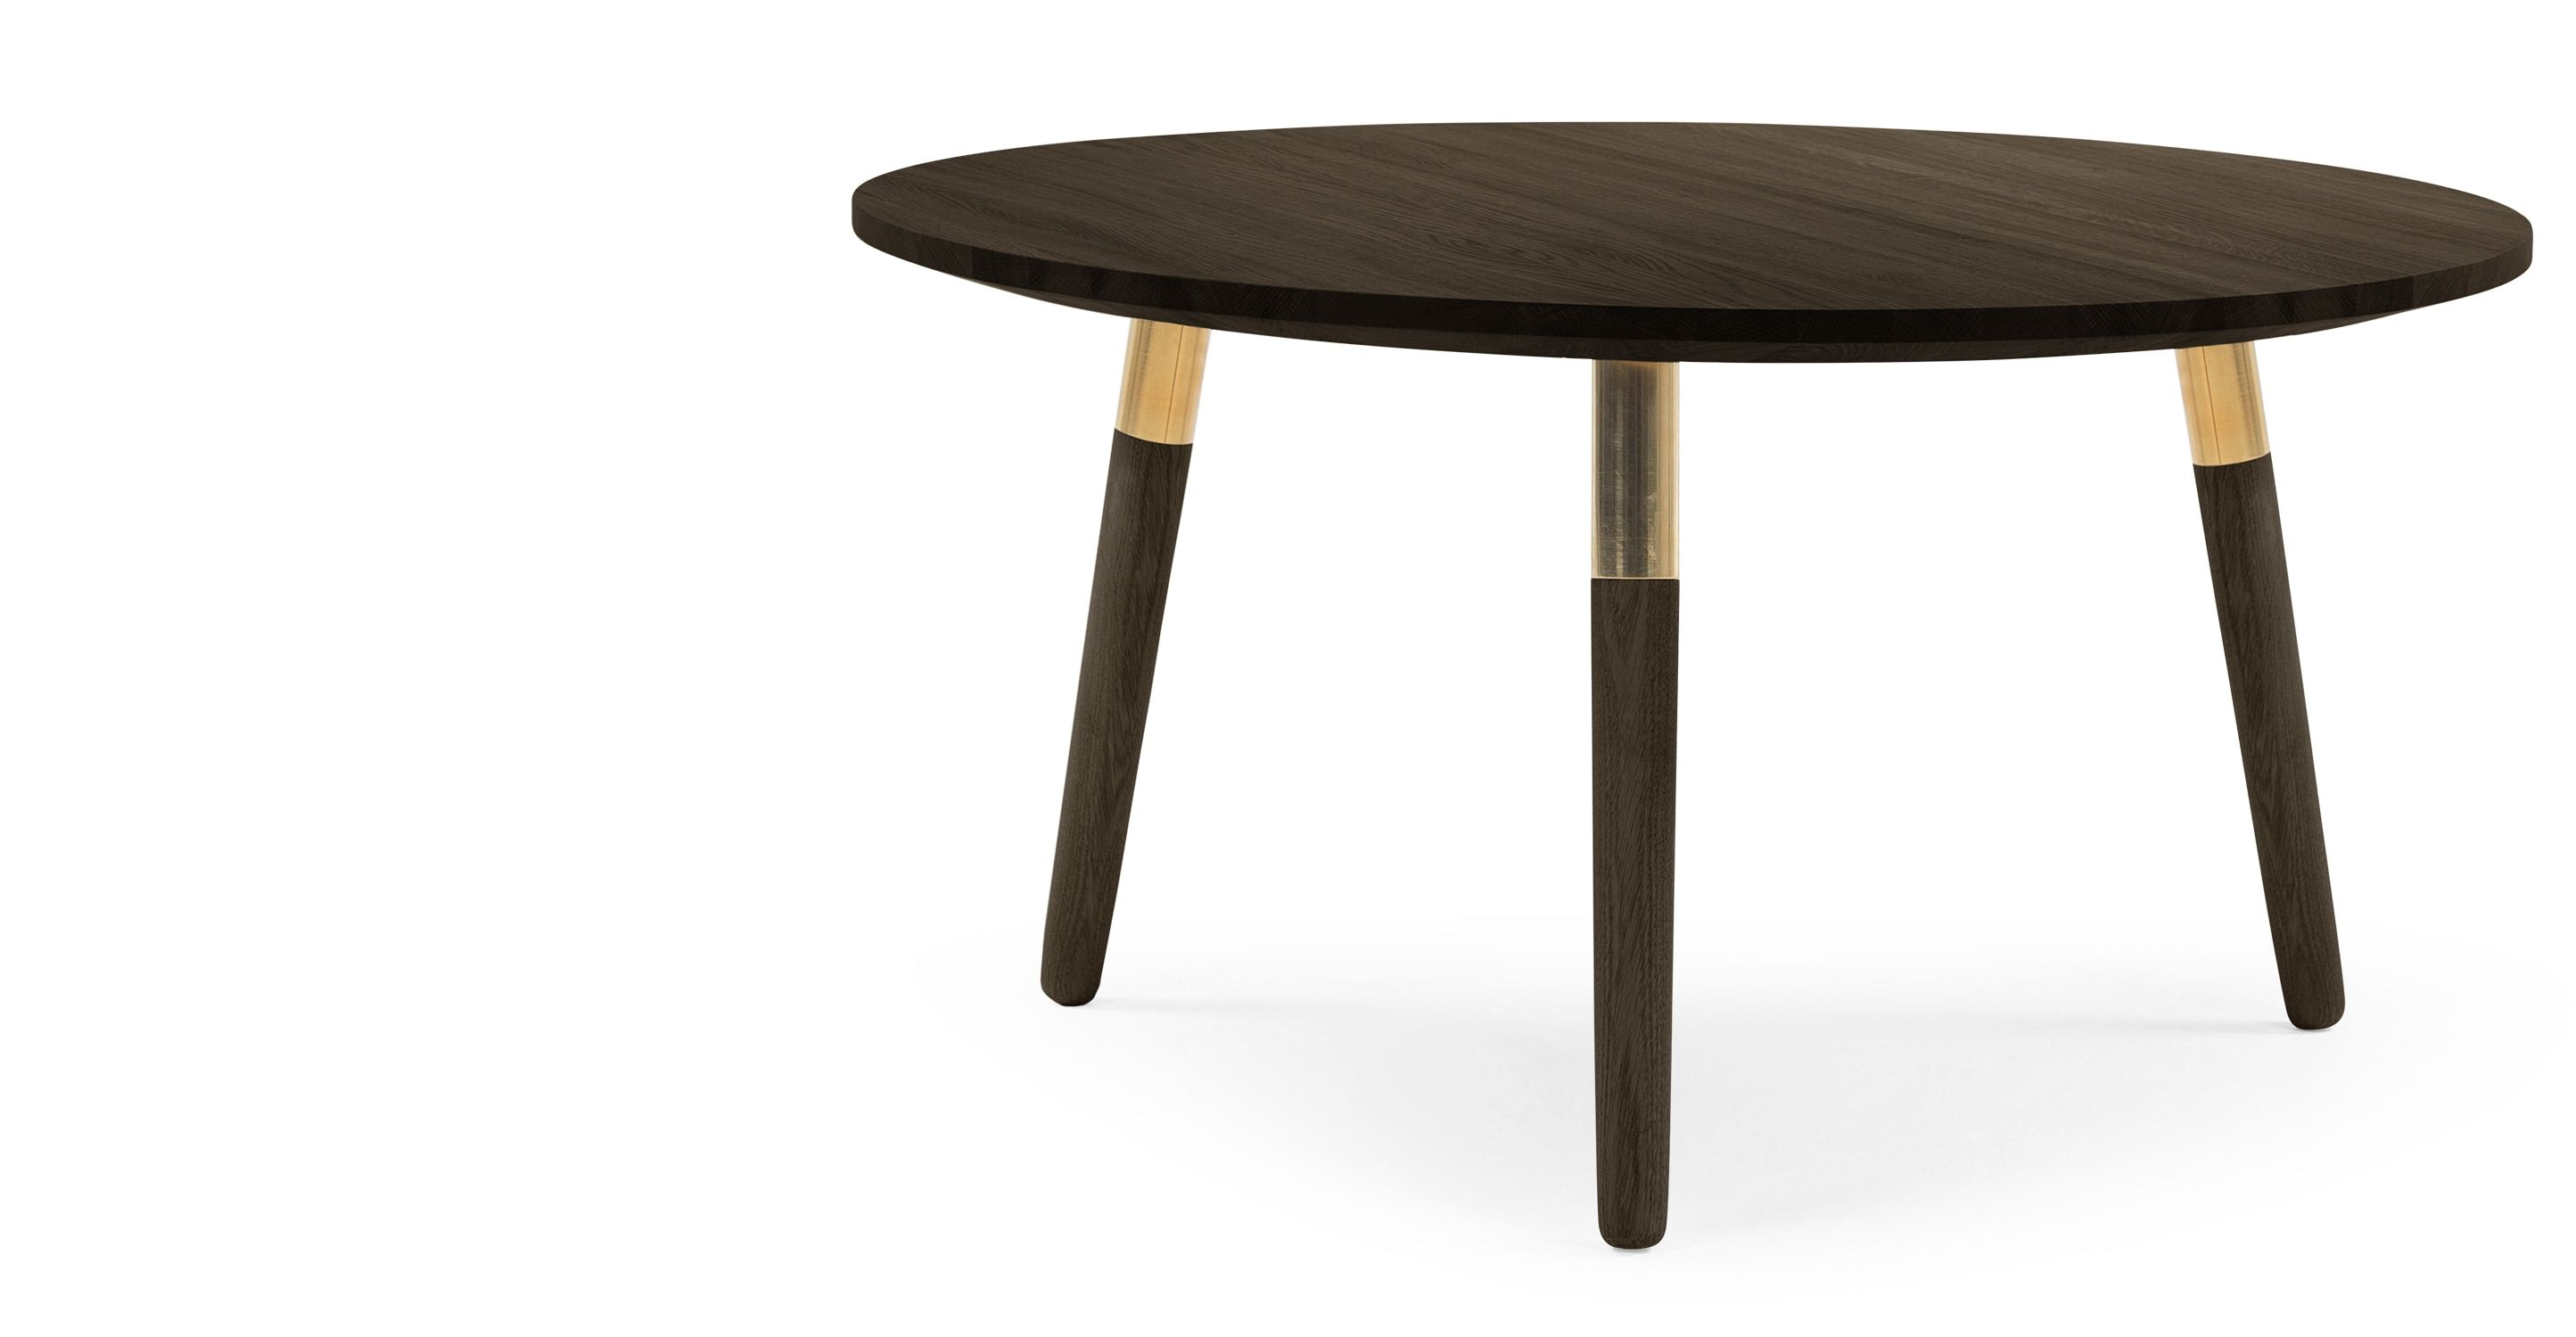 Range Round Coffee Table Dark Stain Ash And Brass Home Coffee Tables Round Coffee Table Coffee Table [ 1500 x 2889 Pixel ]